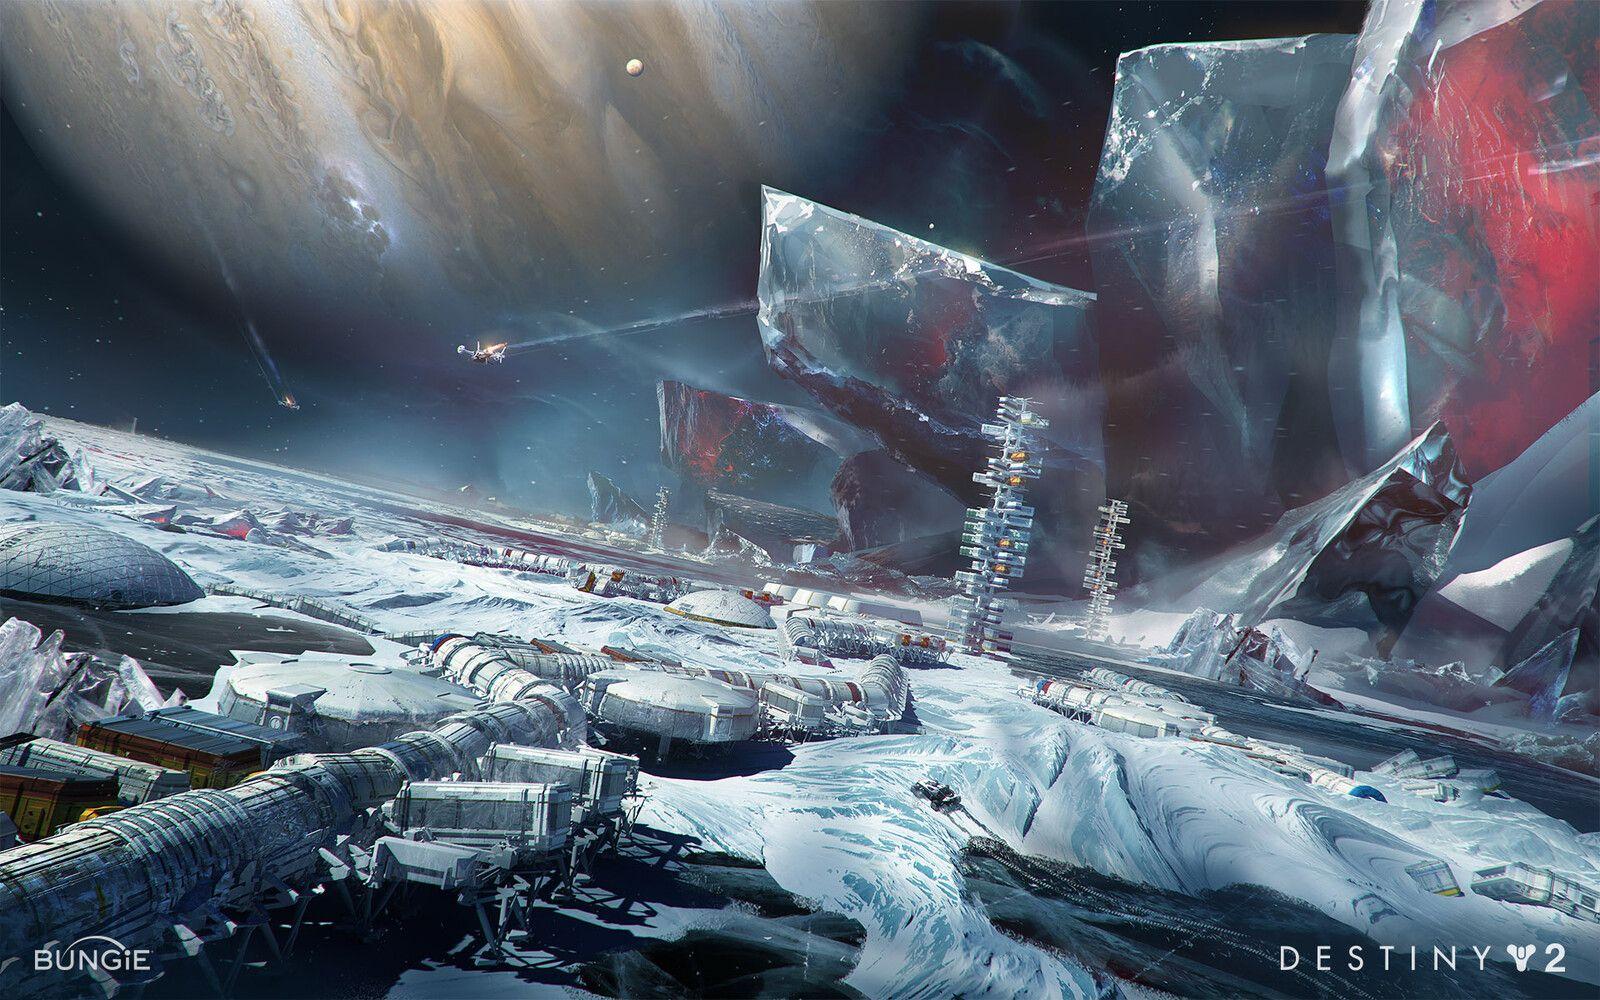 Destiny 2 Beyond Light Early Europa Concept Jesse Van Dijk On Artstation At Https Www Artstation Com Artwork Rapkb2 Destiny 2 Beyond Light Destiny Concept